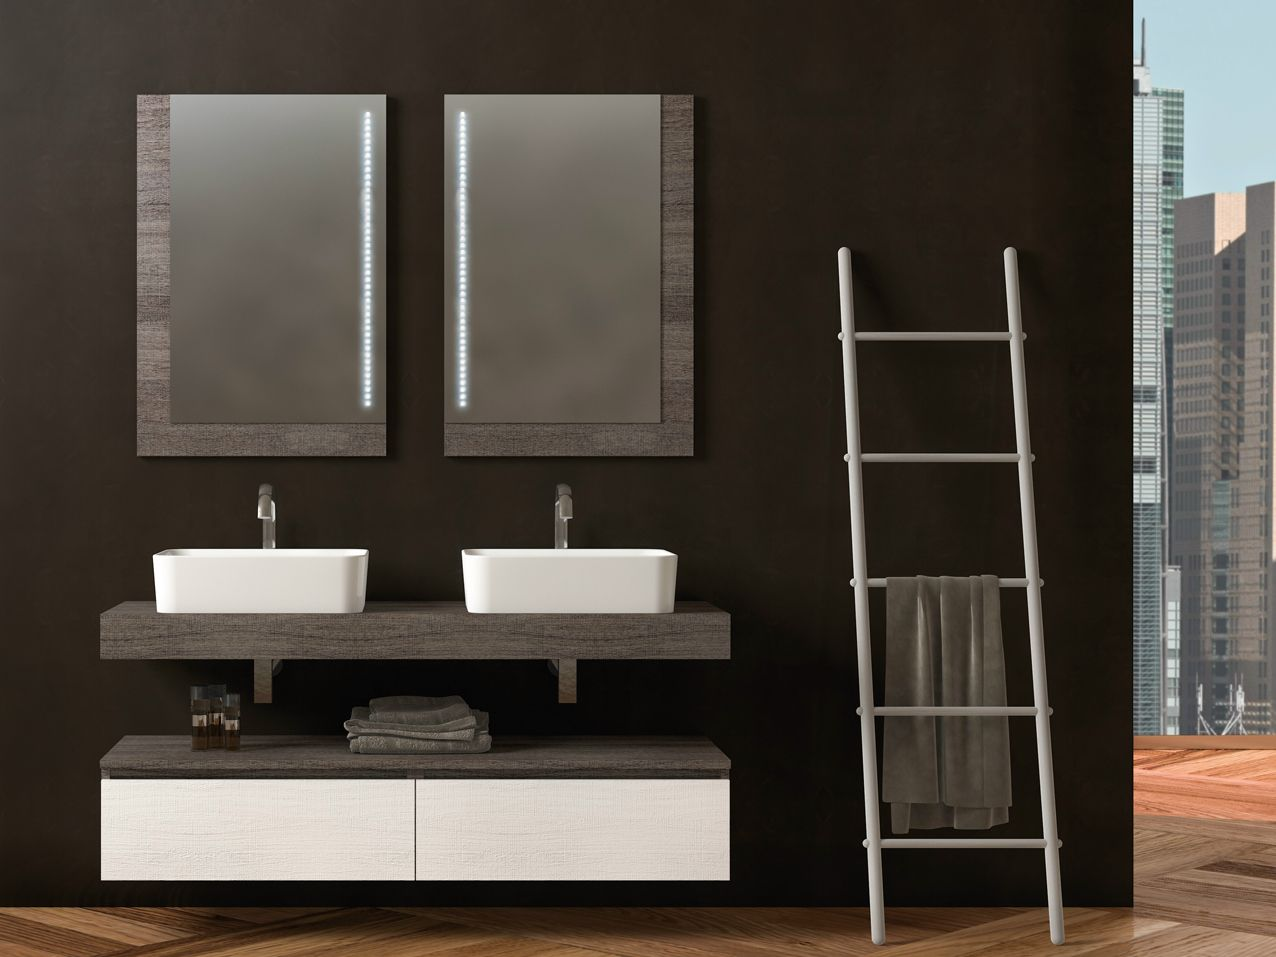 Mobili bagno moderni doppio lavabo mobile lavabo - Mobili bagno moderni ...